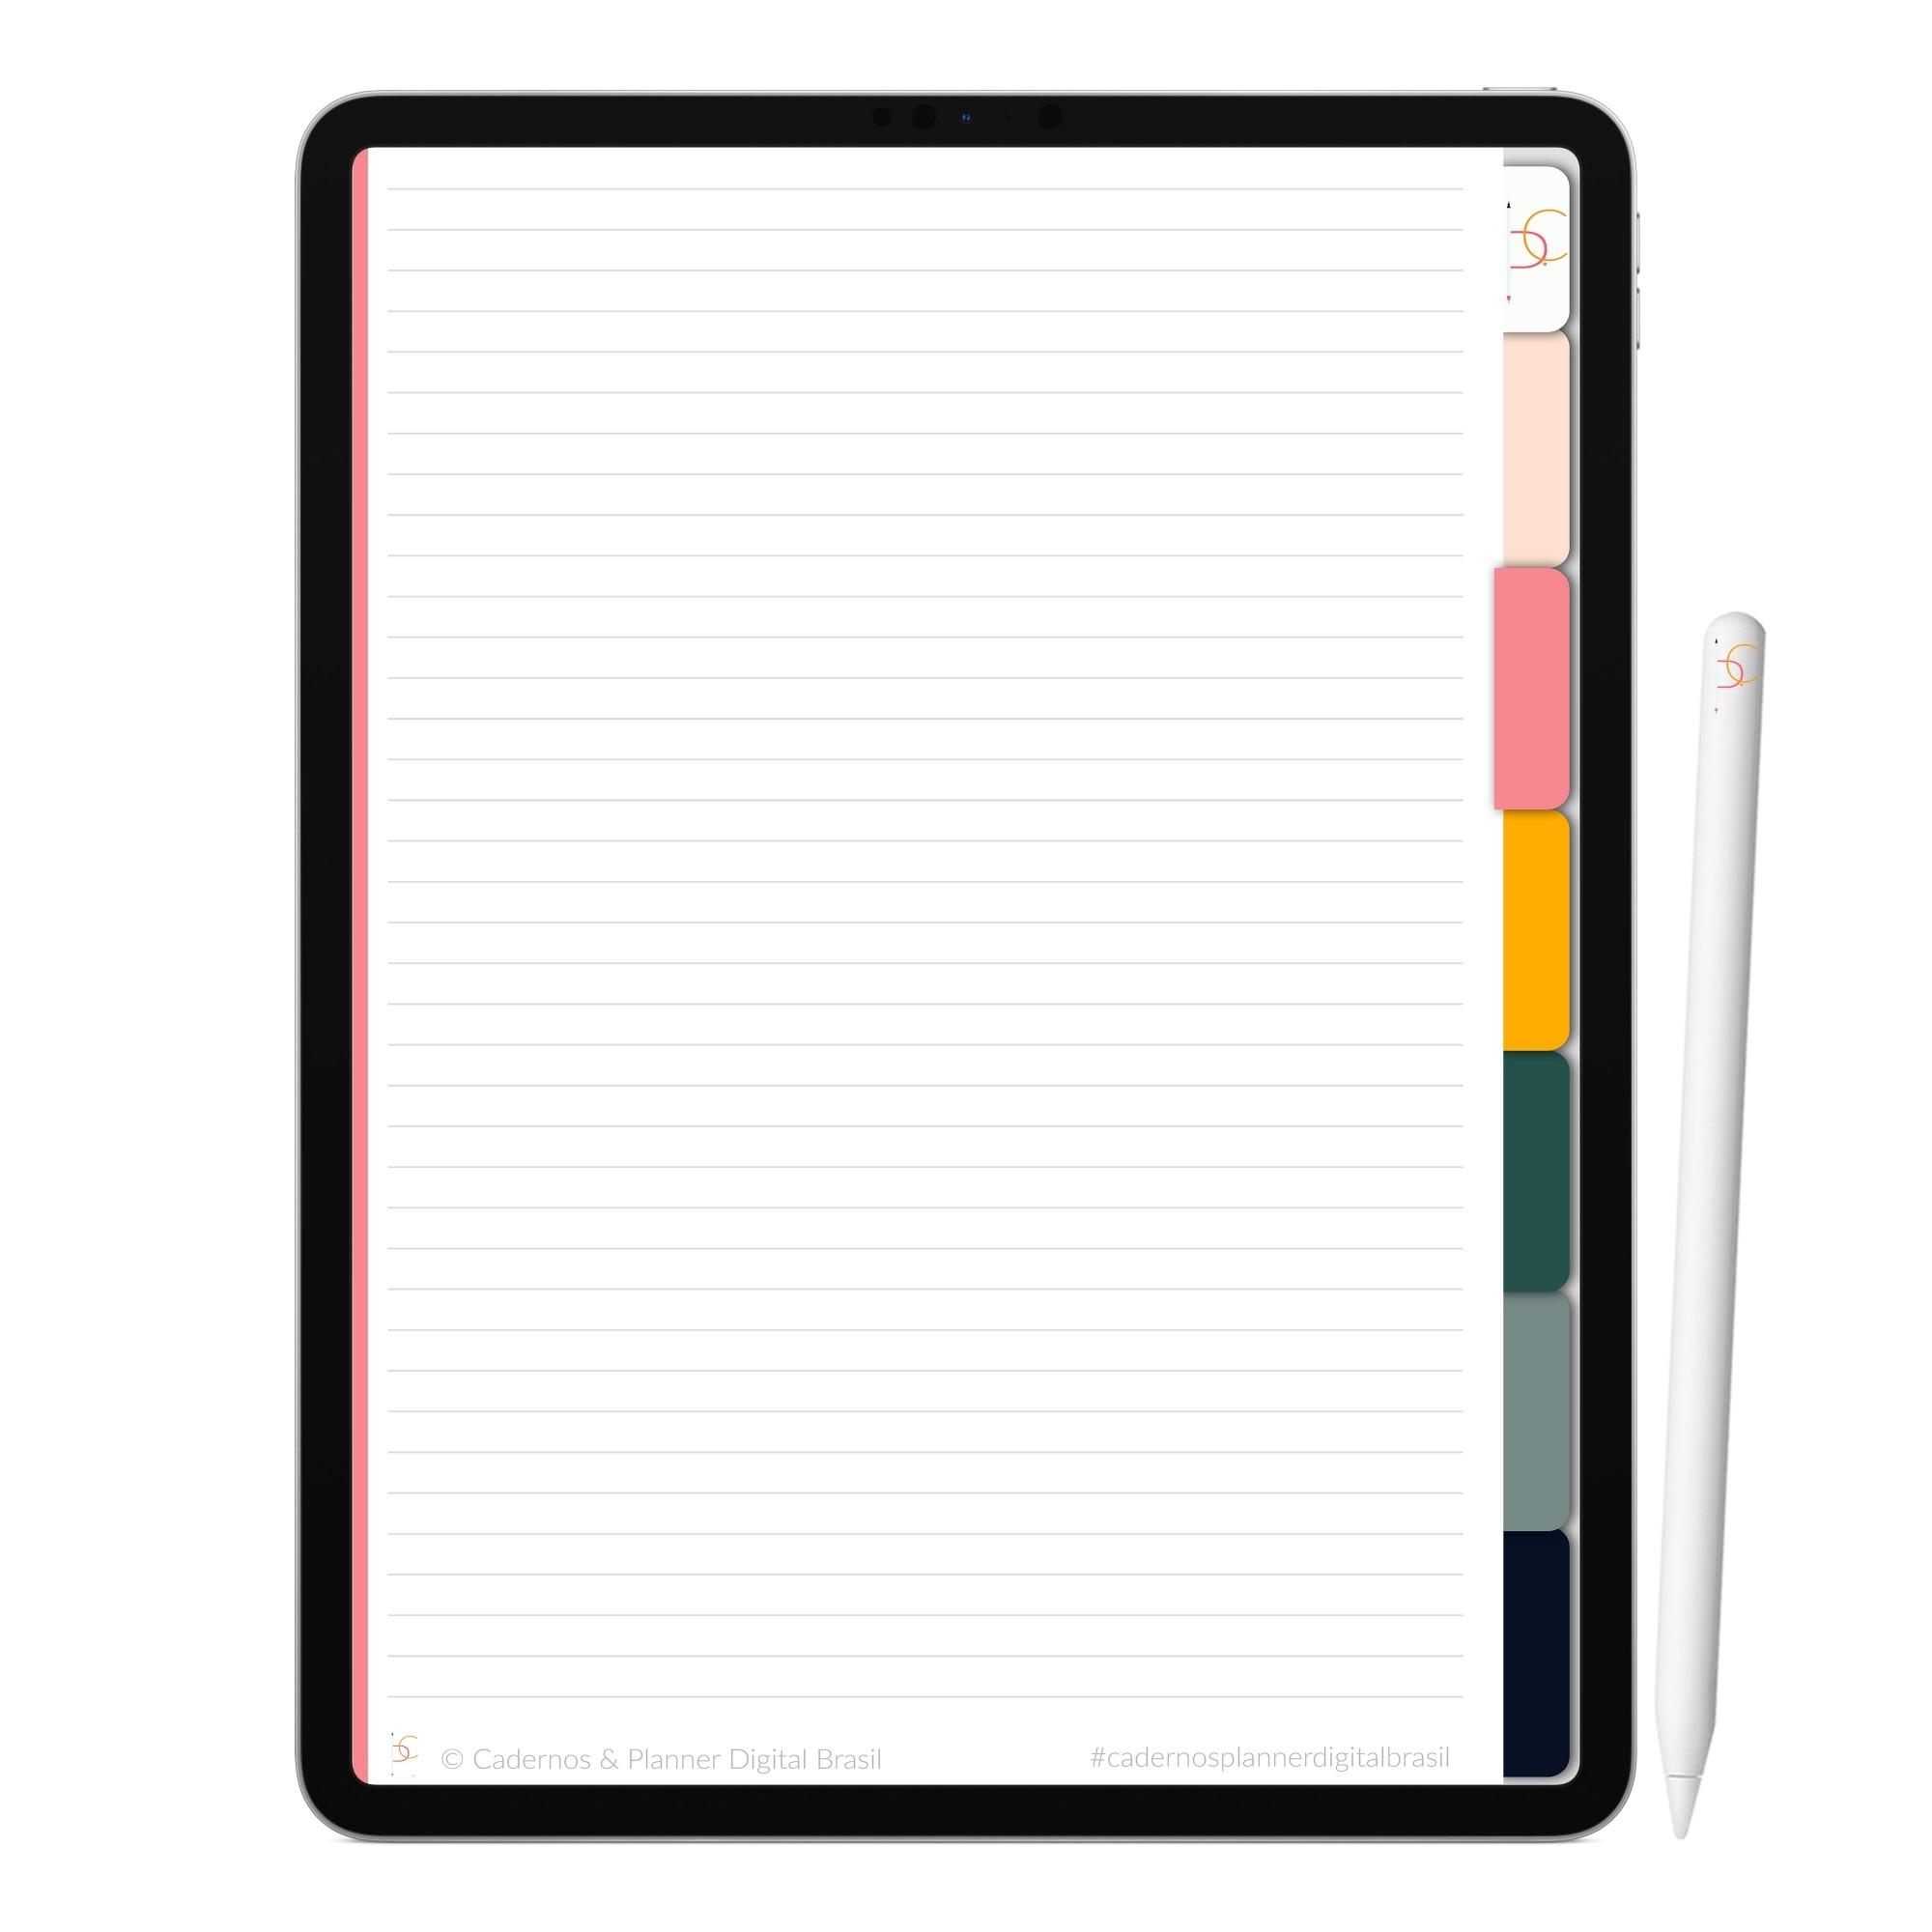 Caderno Digital Meia Noite| Seis Divisórias Interativo| iPad Tablet | Download Instantâneo